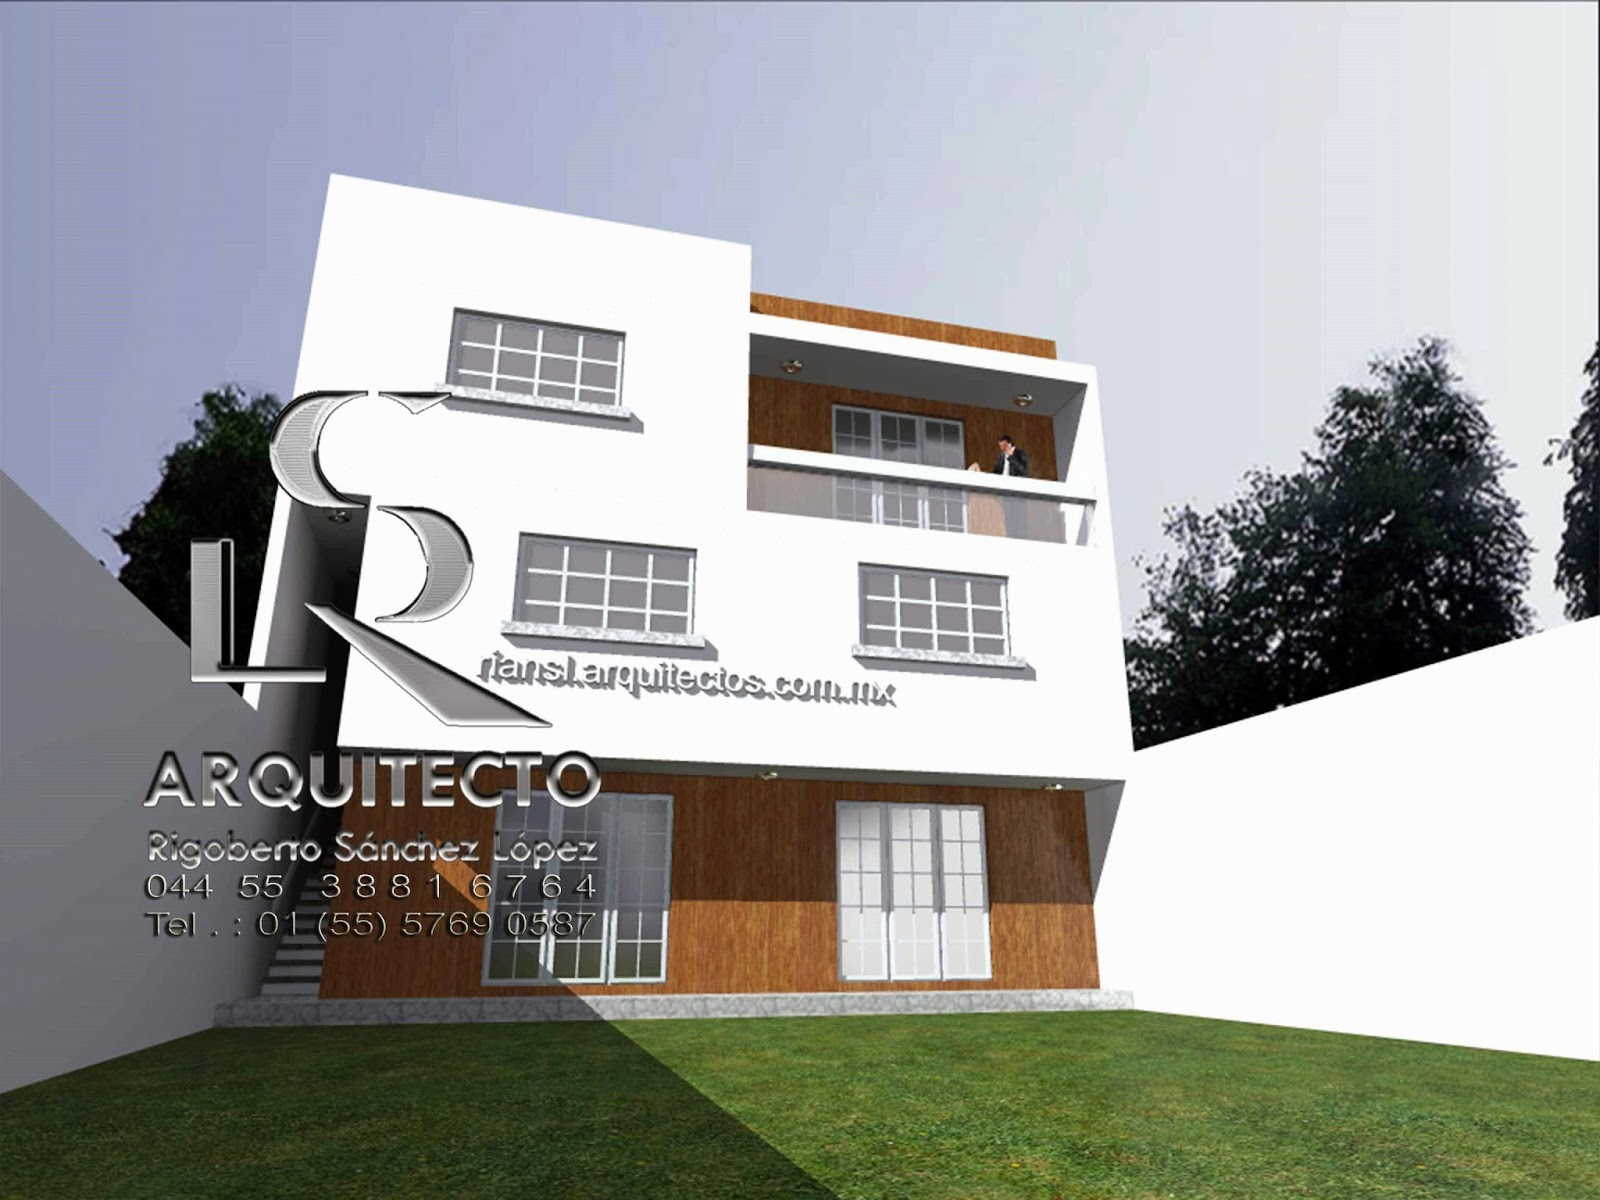 Proyectos virtuales dise o de casa habitaci n en 3d arq - Proyectos de casas ...